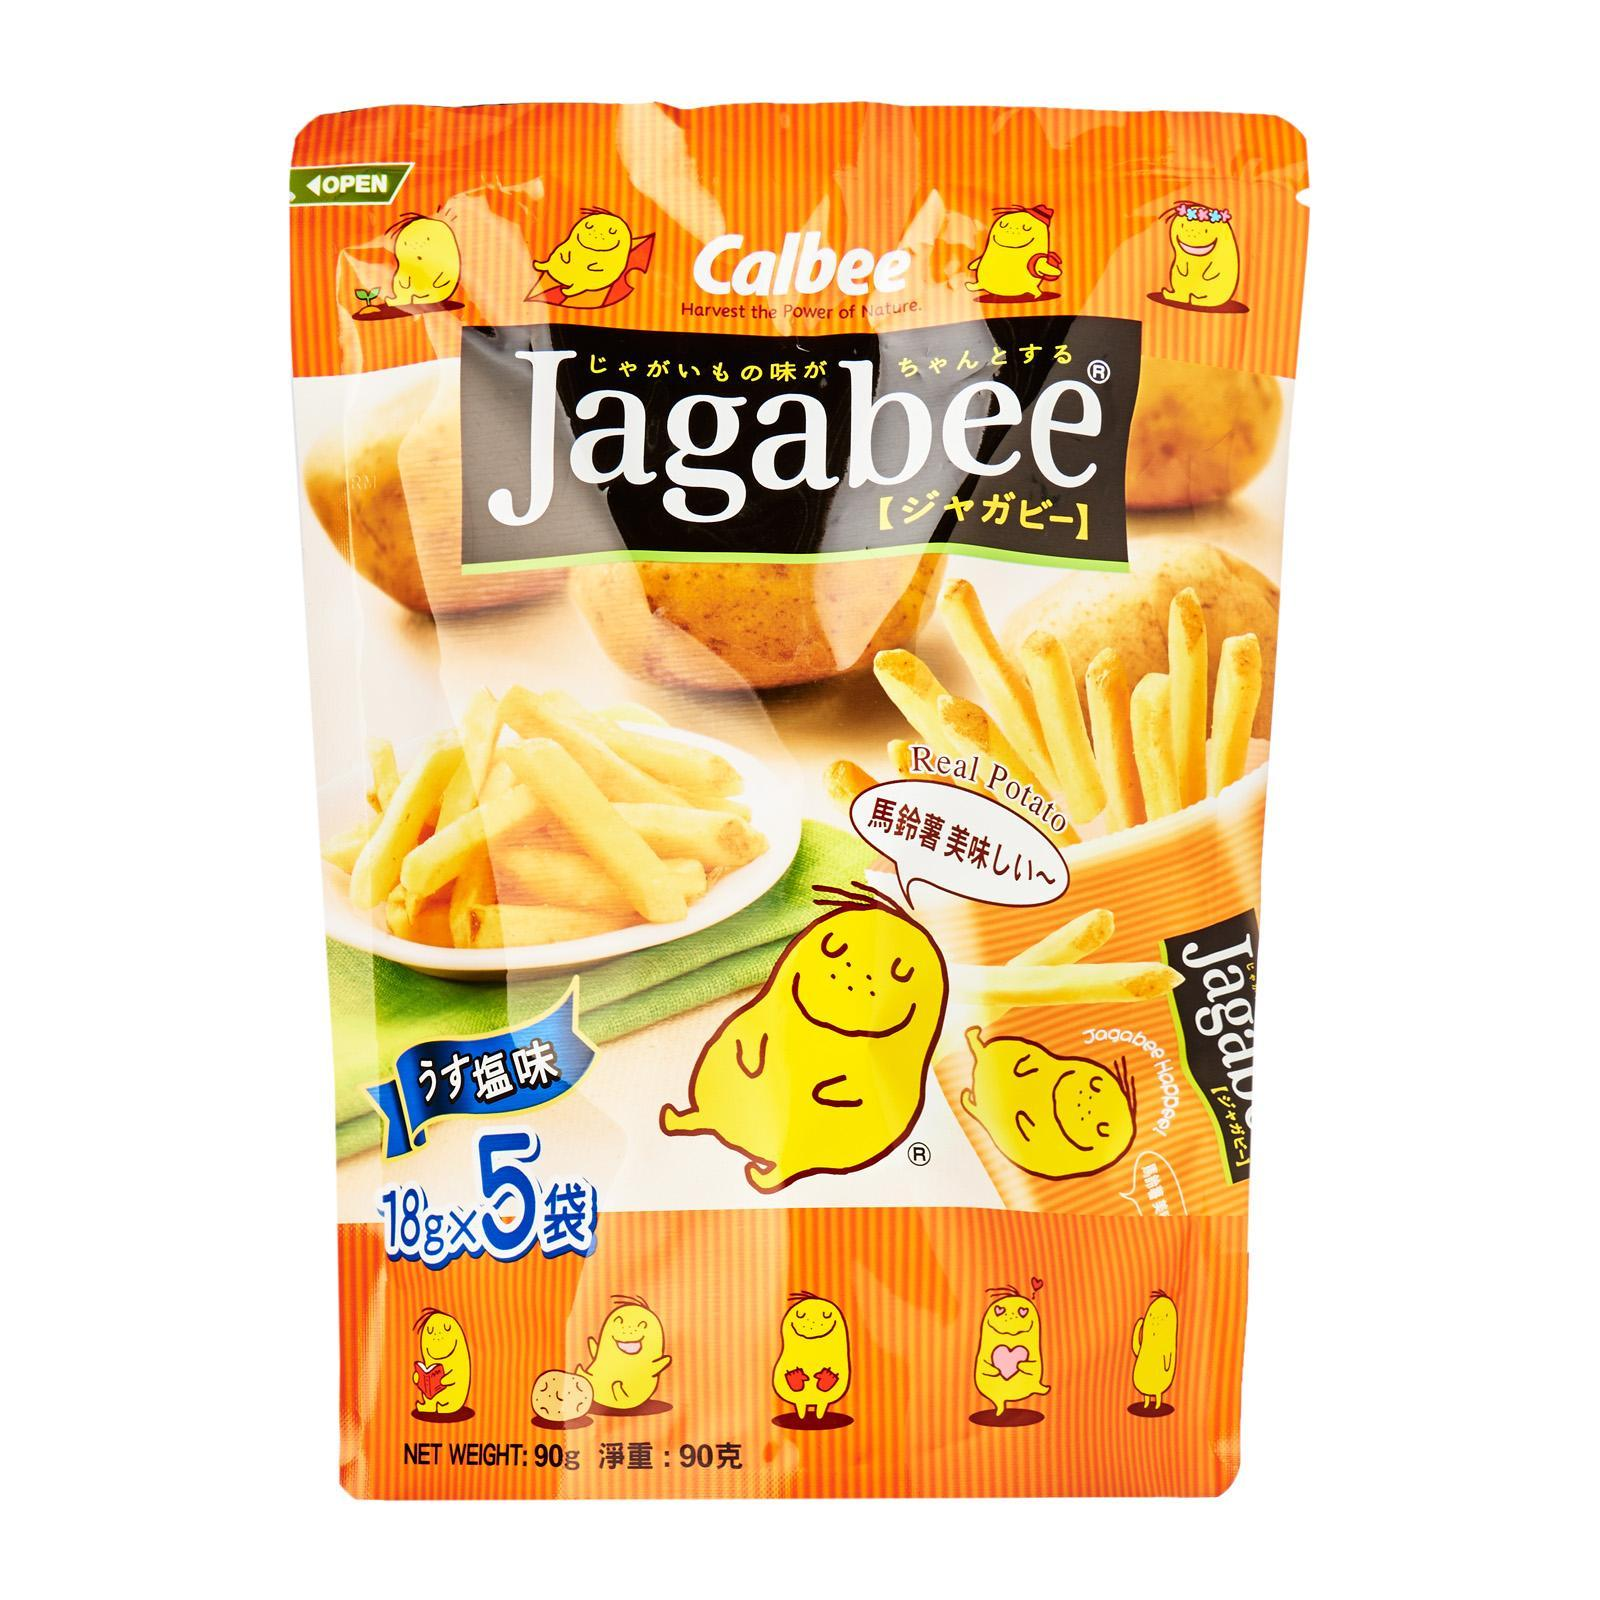 Calbee Jagabee Original Pouch Potato Sticks